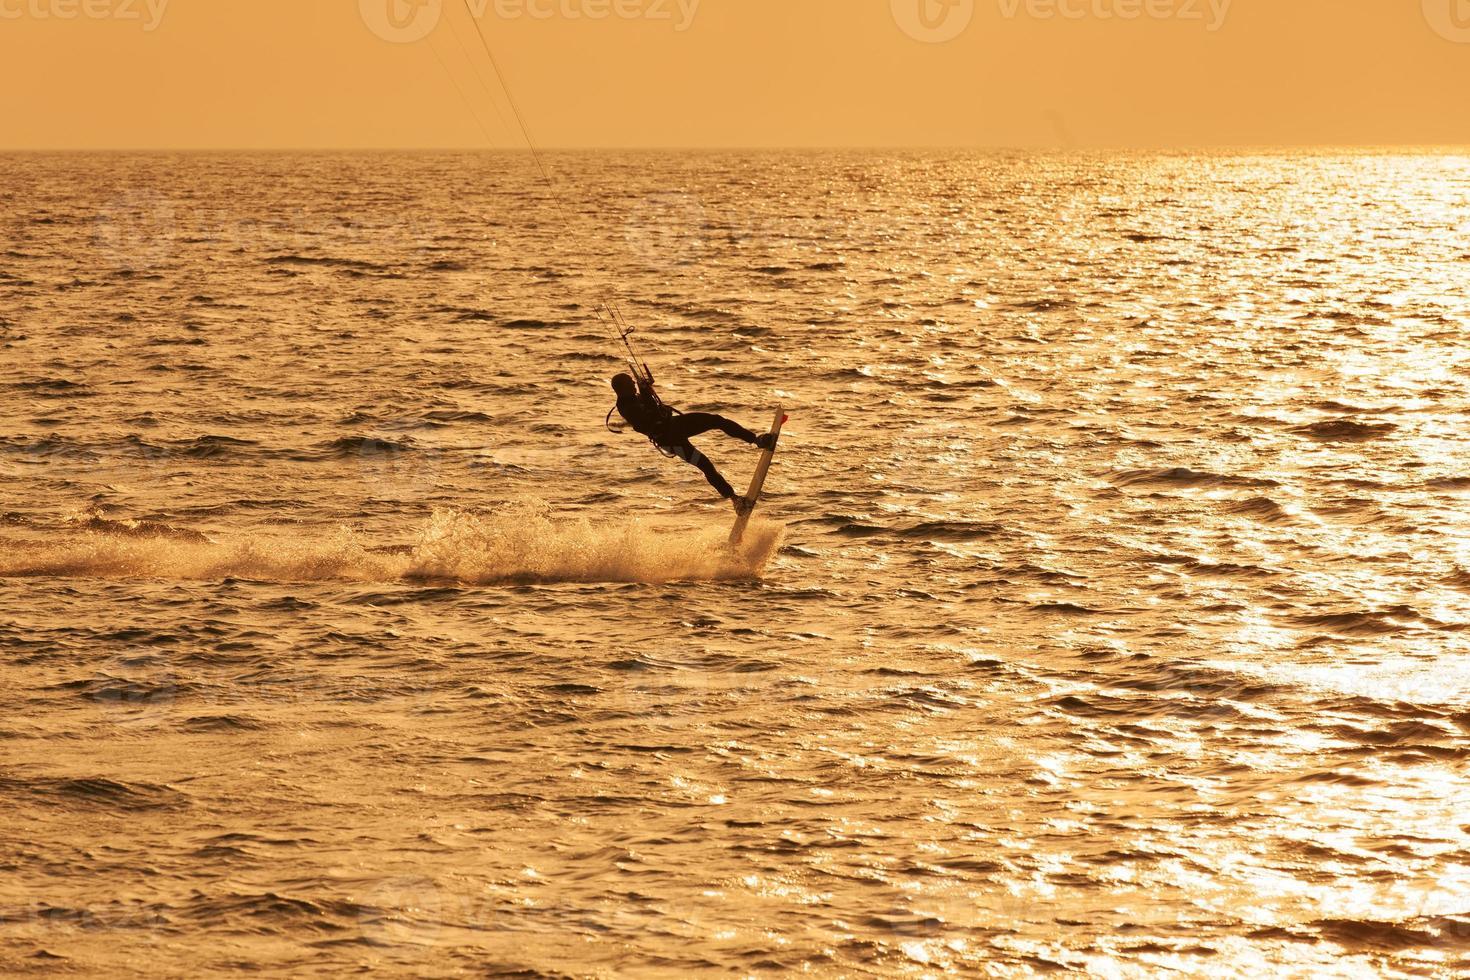 kite surfista pulando da água foto